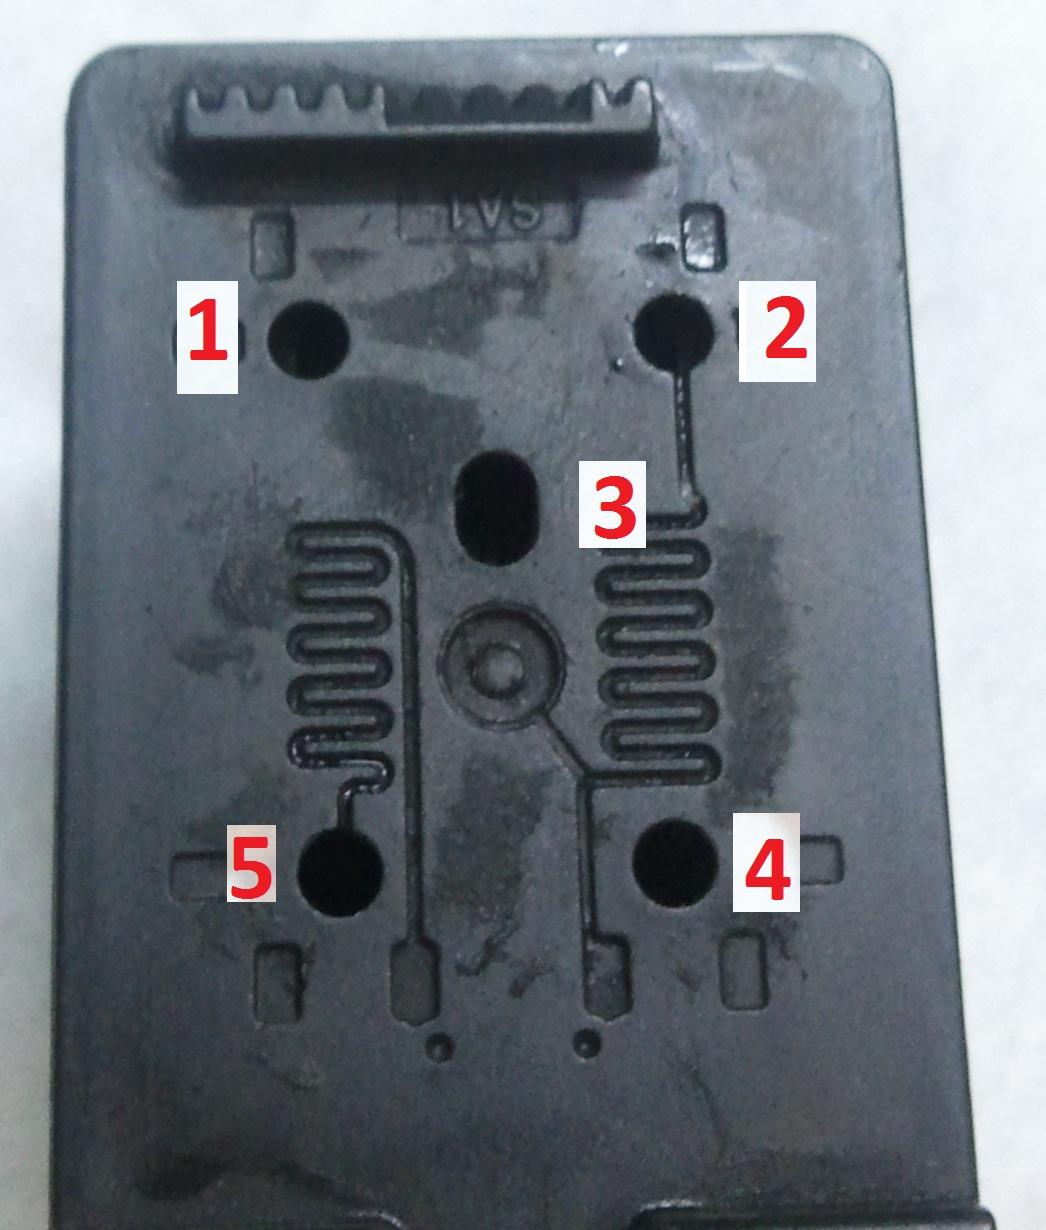 Refill Hp 802 Cartridge Tinta 46 Black Colour Original After Peeling Off The Sticker Label